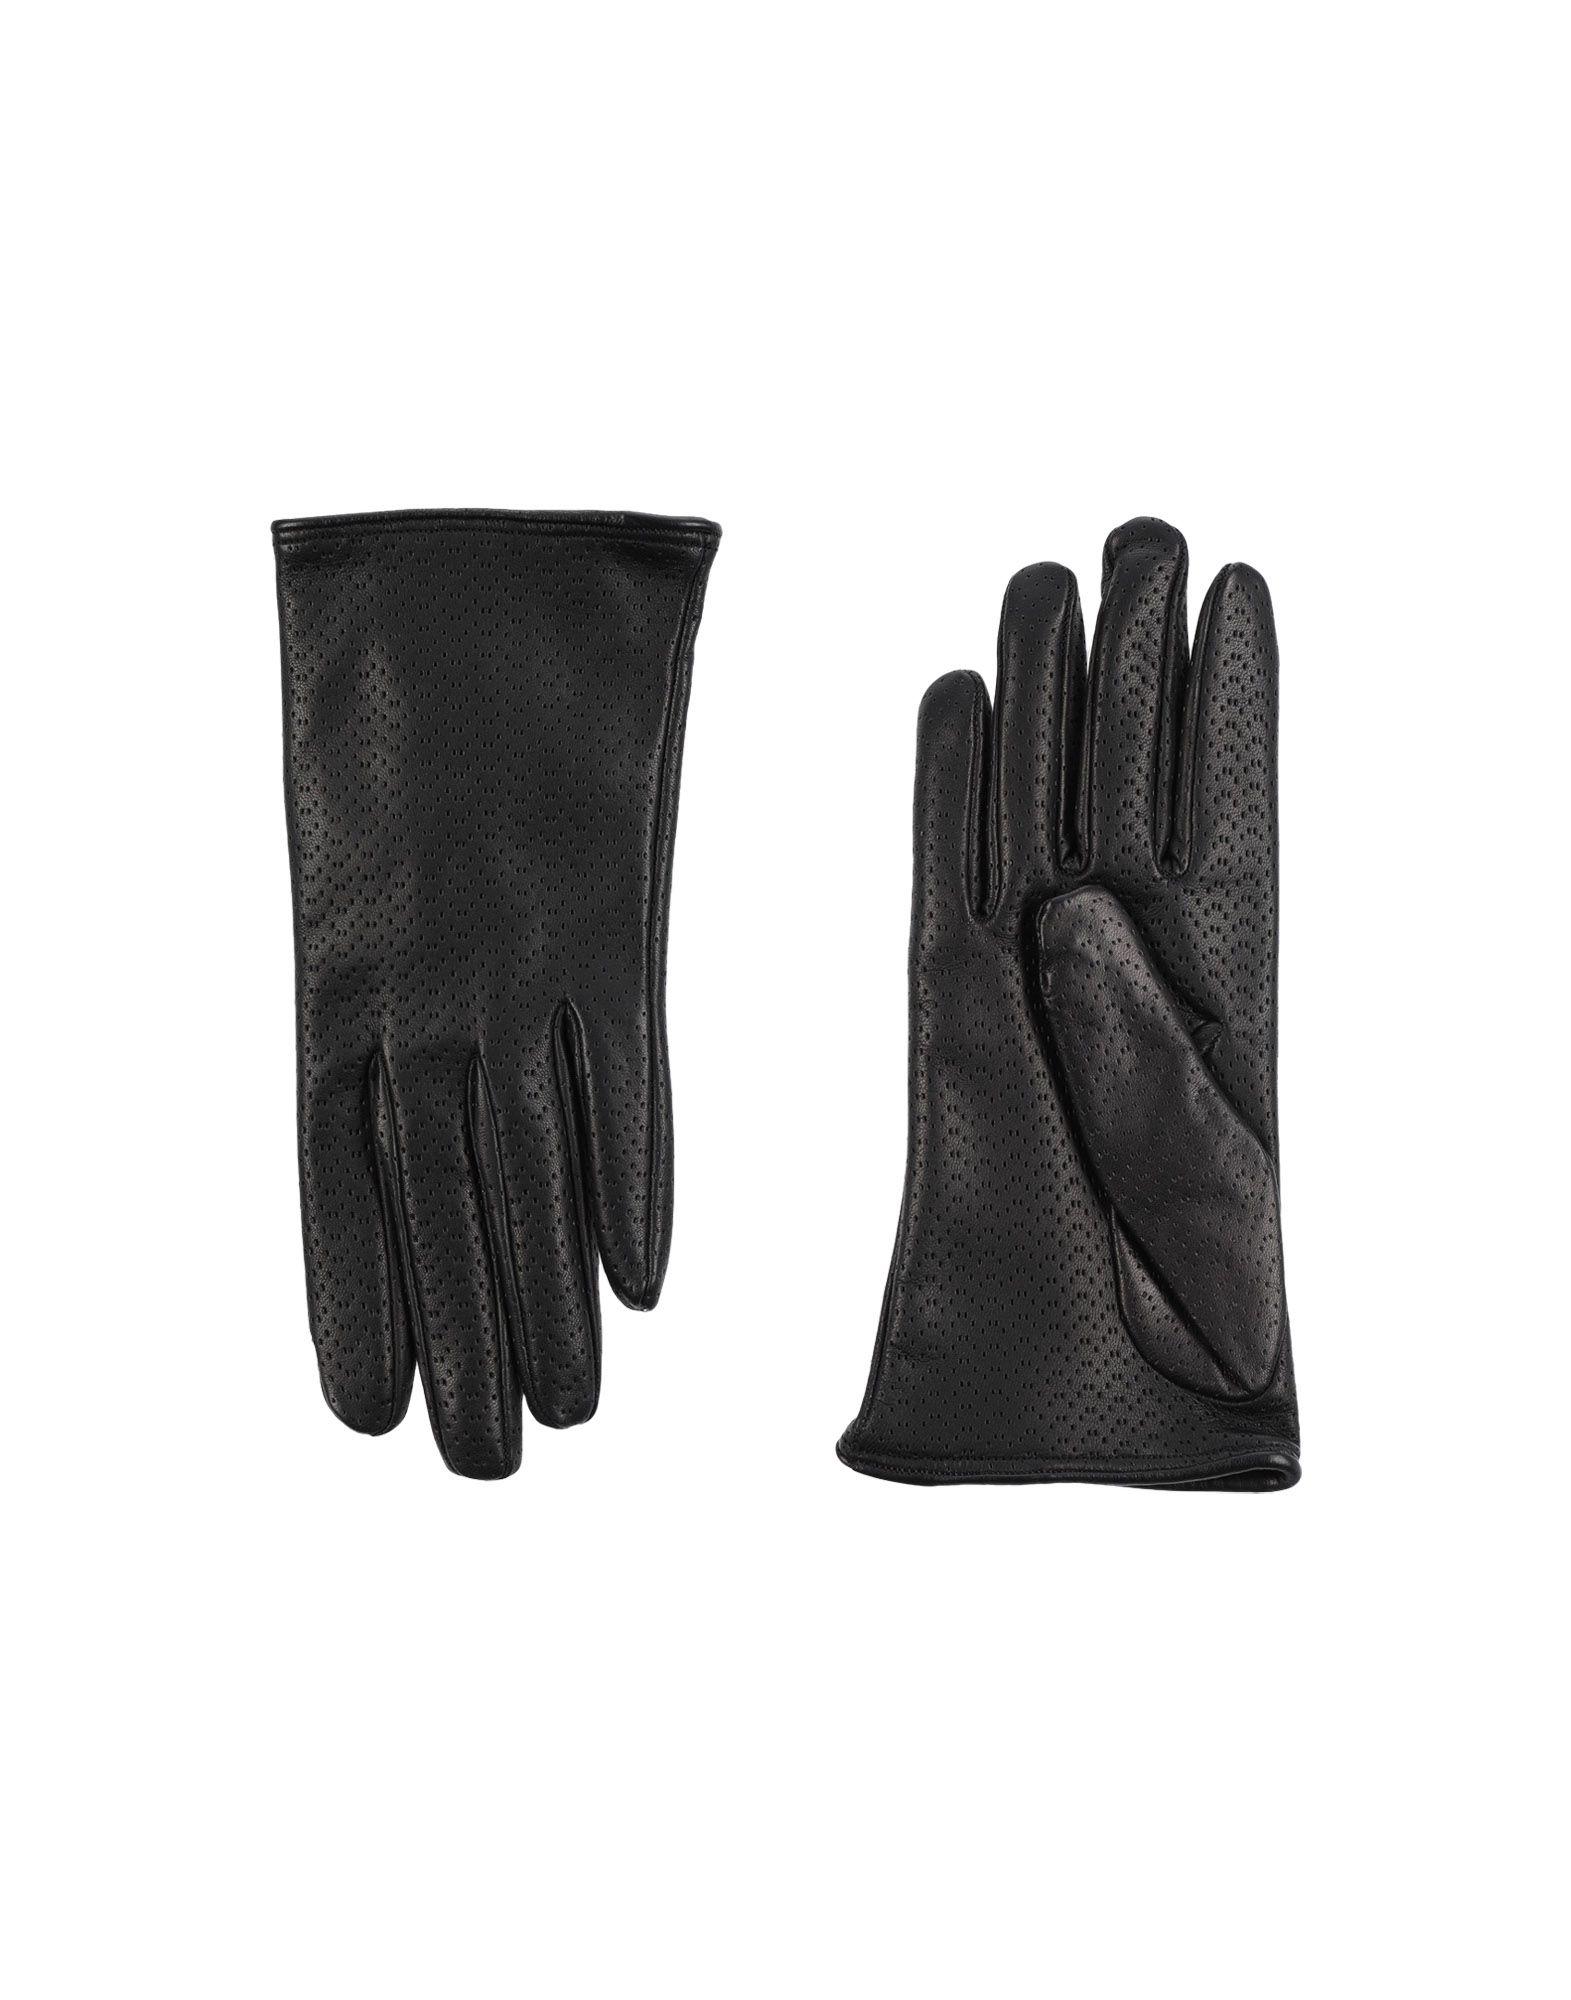 FINGERS Venezia Перчатки scoyco mc16 water resistant full fingers motorcycle gloves blue black pair size l